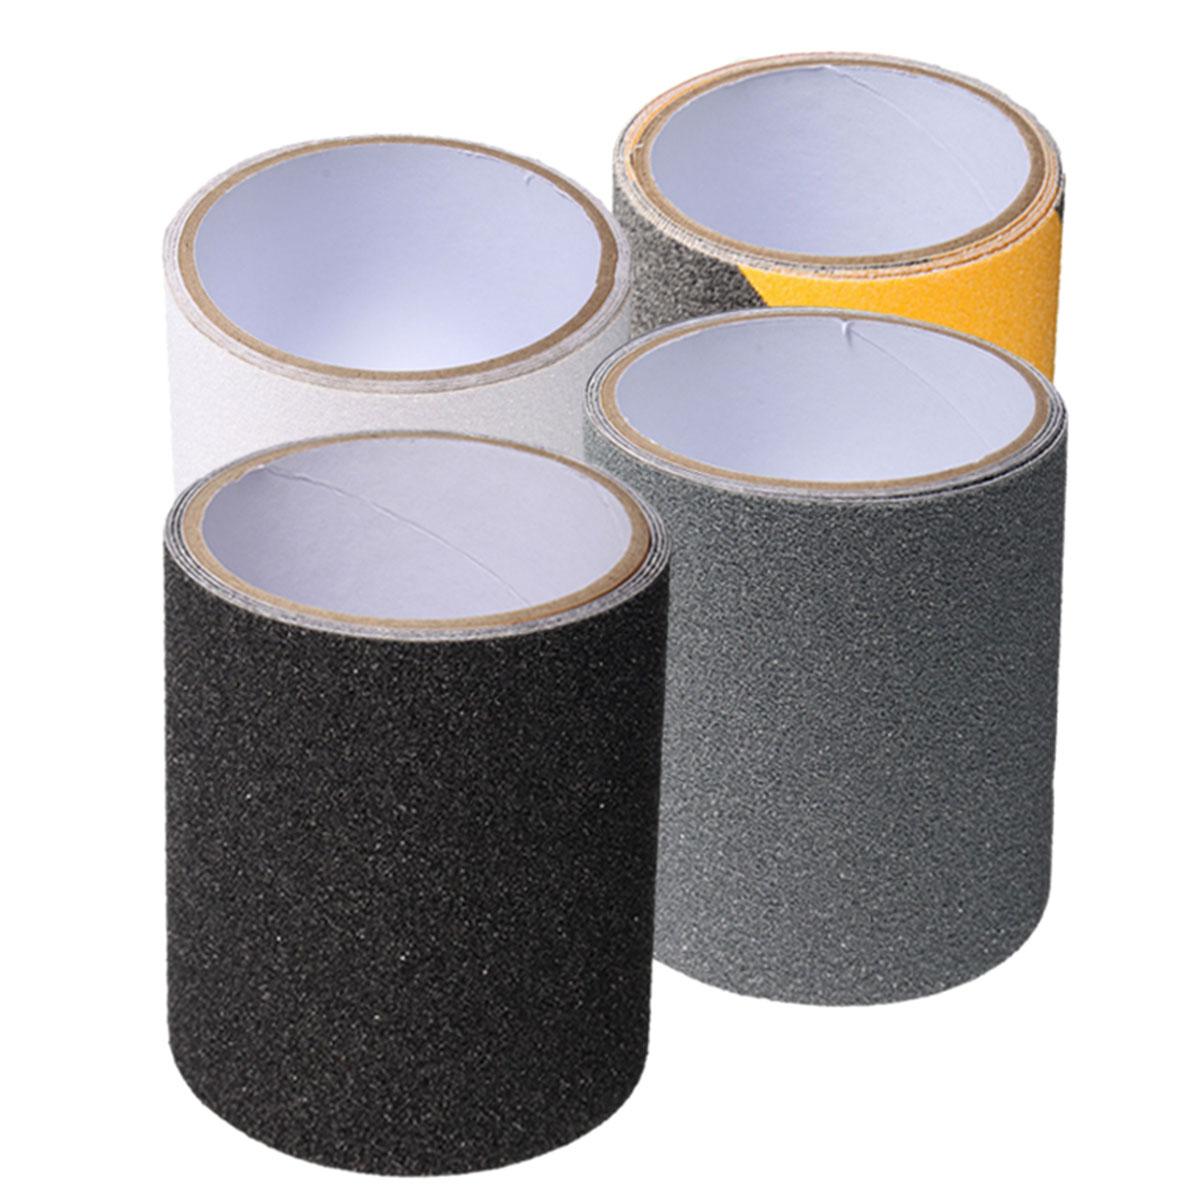 Roll Safety Non Skid Tape Anti Slip Tape Sticker Grip Safe Grit Bathroom Shower 2.5CM